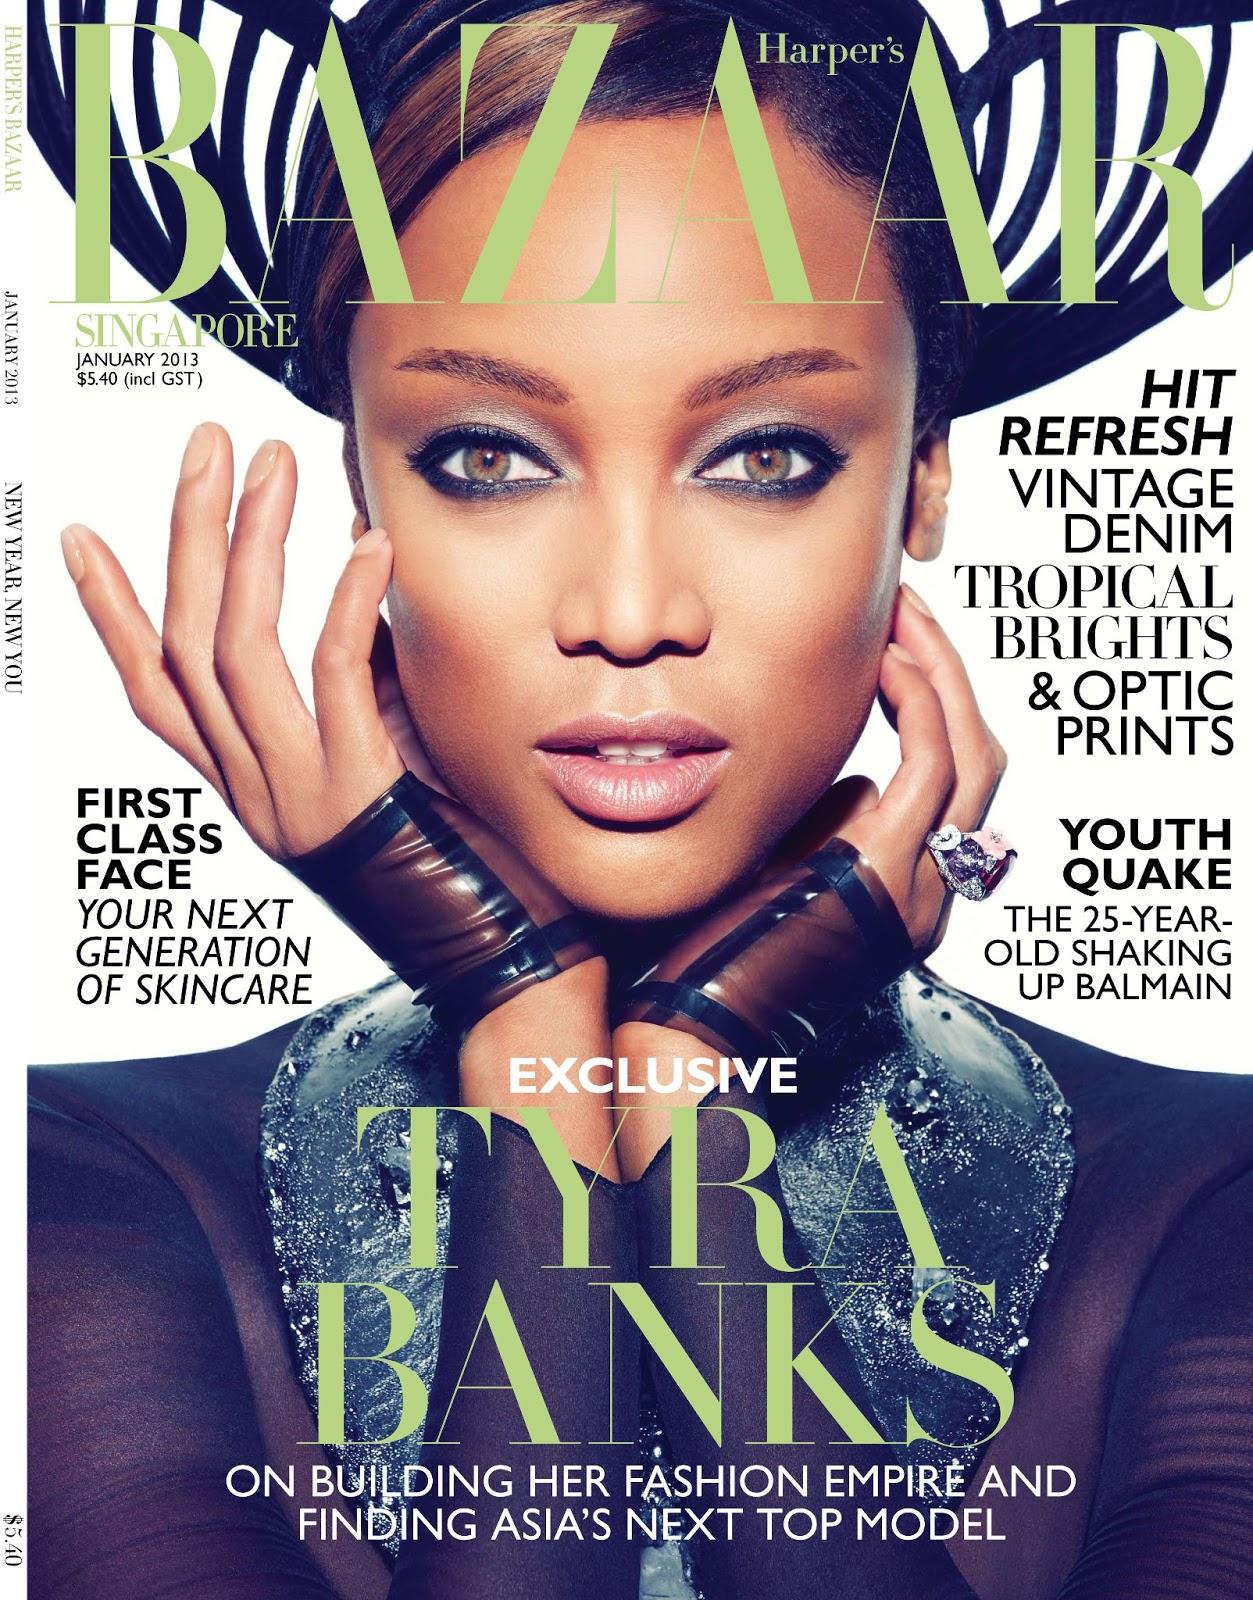 http://4.bp.blogspot.com/-xCftRzl29Pg/UOuZoMhtfbI/AAAAAAAA6Y0/_9vQRSair6s/s1600/Harpers-Bazaar-Singapore-January-2013-Tyra-Banks-Cover-by-Gan.jpg